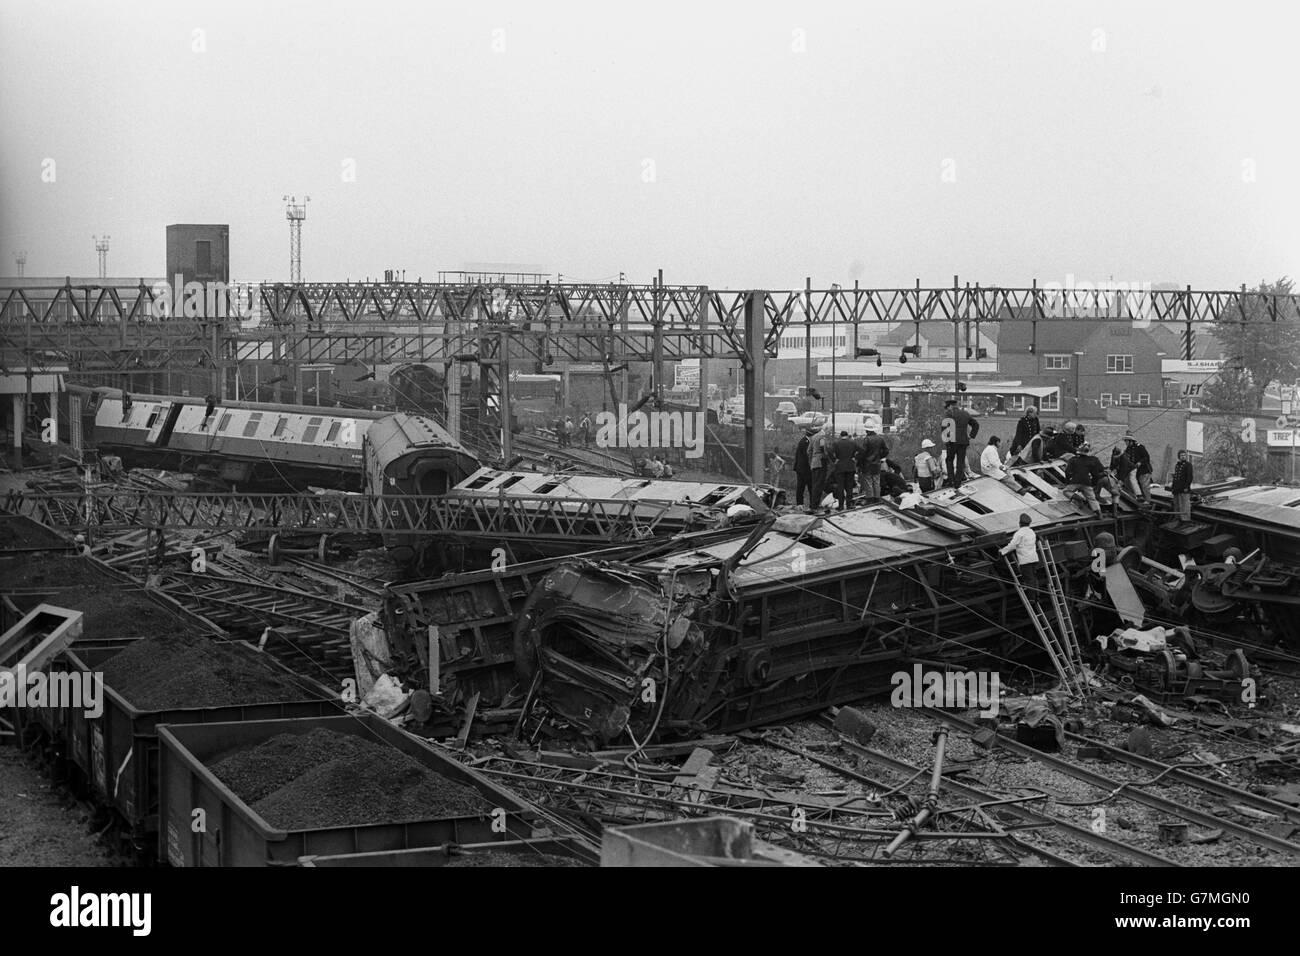 Train crash scene black and white stock photos images